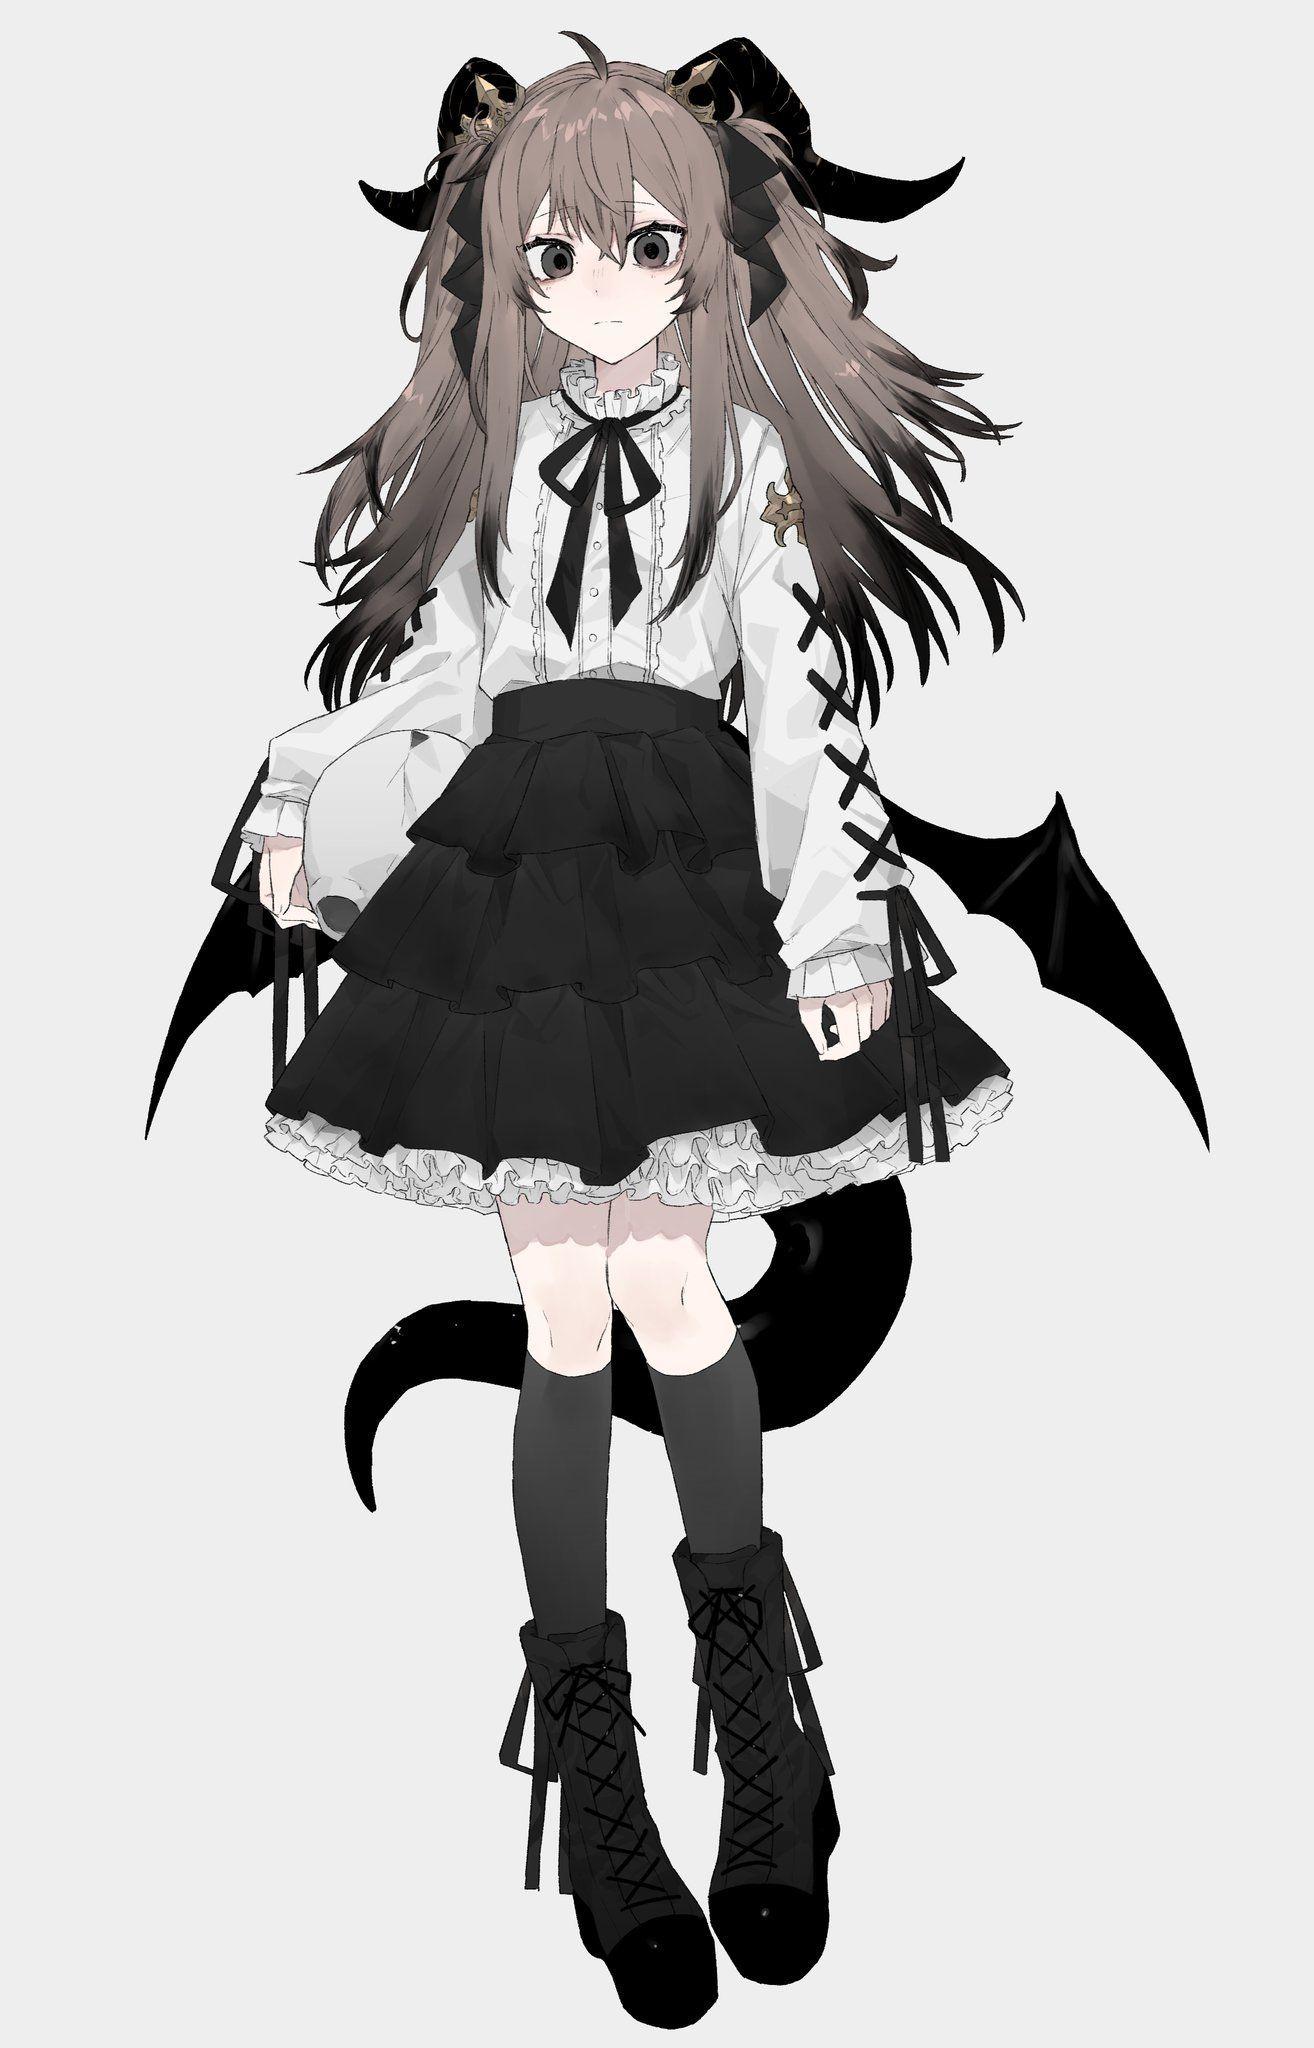 龍/通販開始 on in 2020 Anime, Anime art girl, Anime chibi